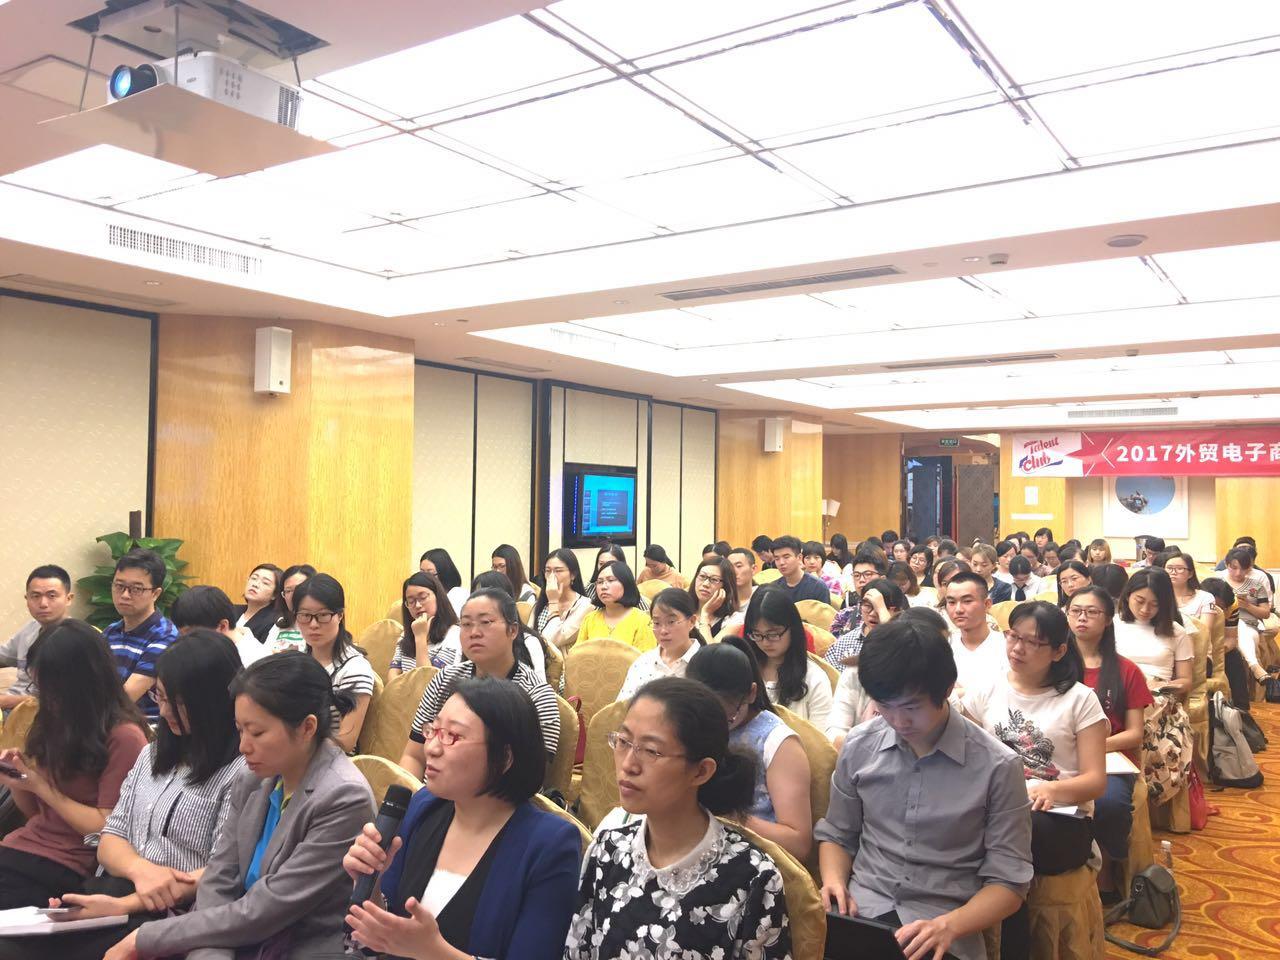 improvement seminars run by Made-in-China